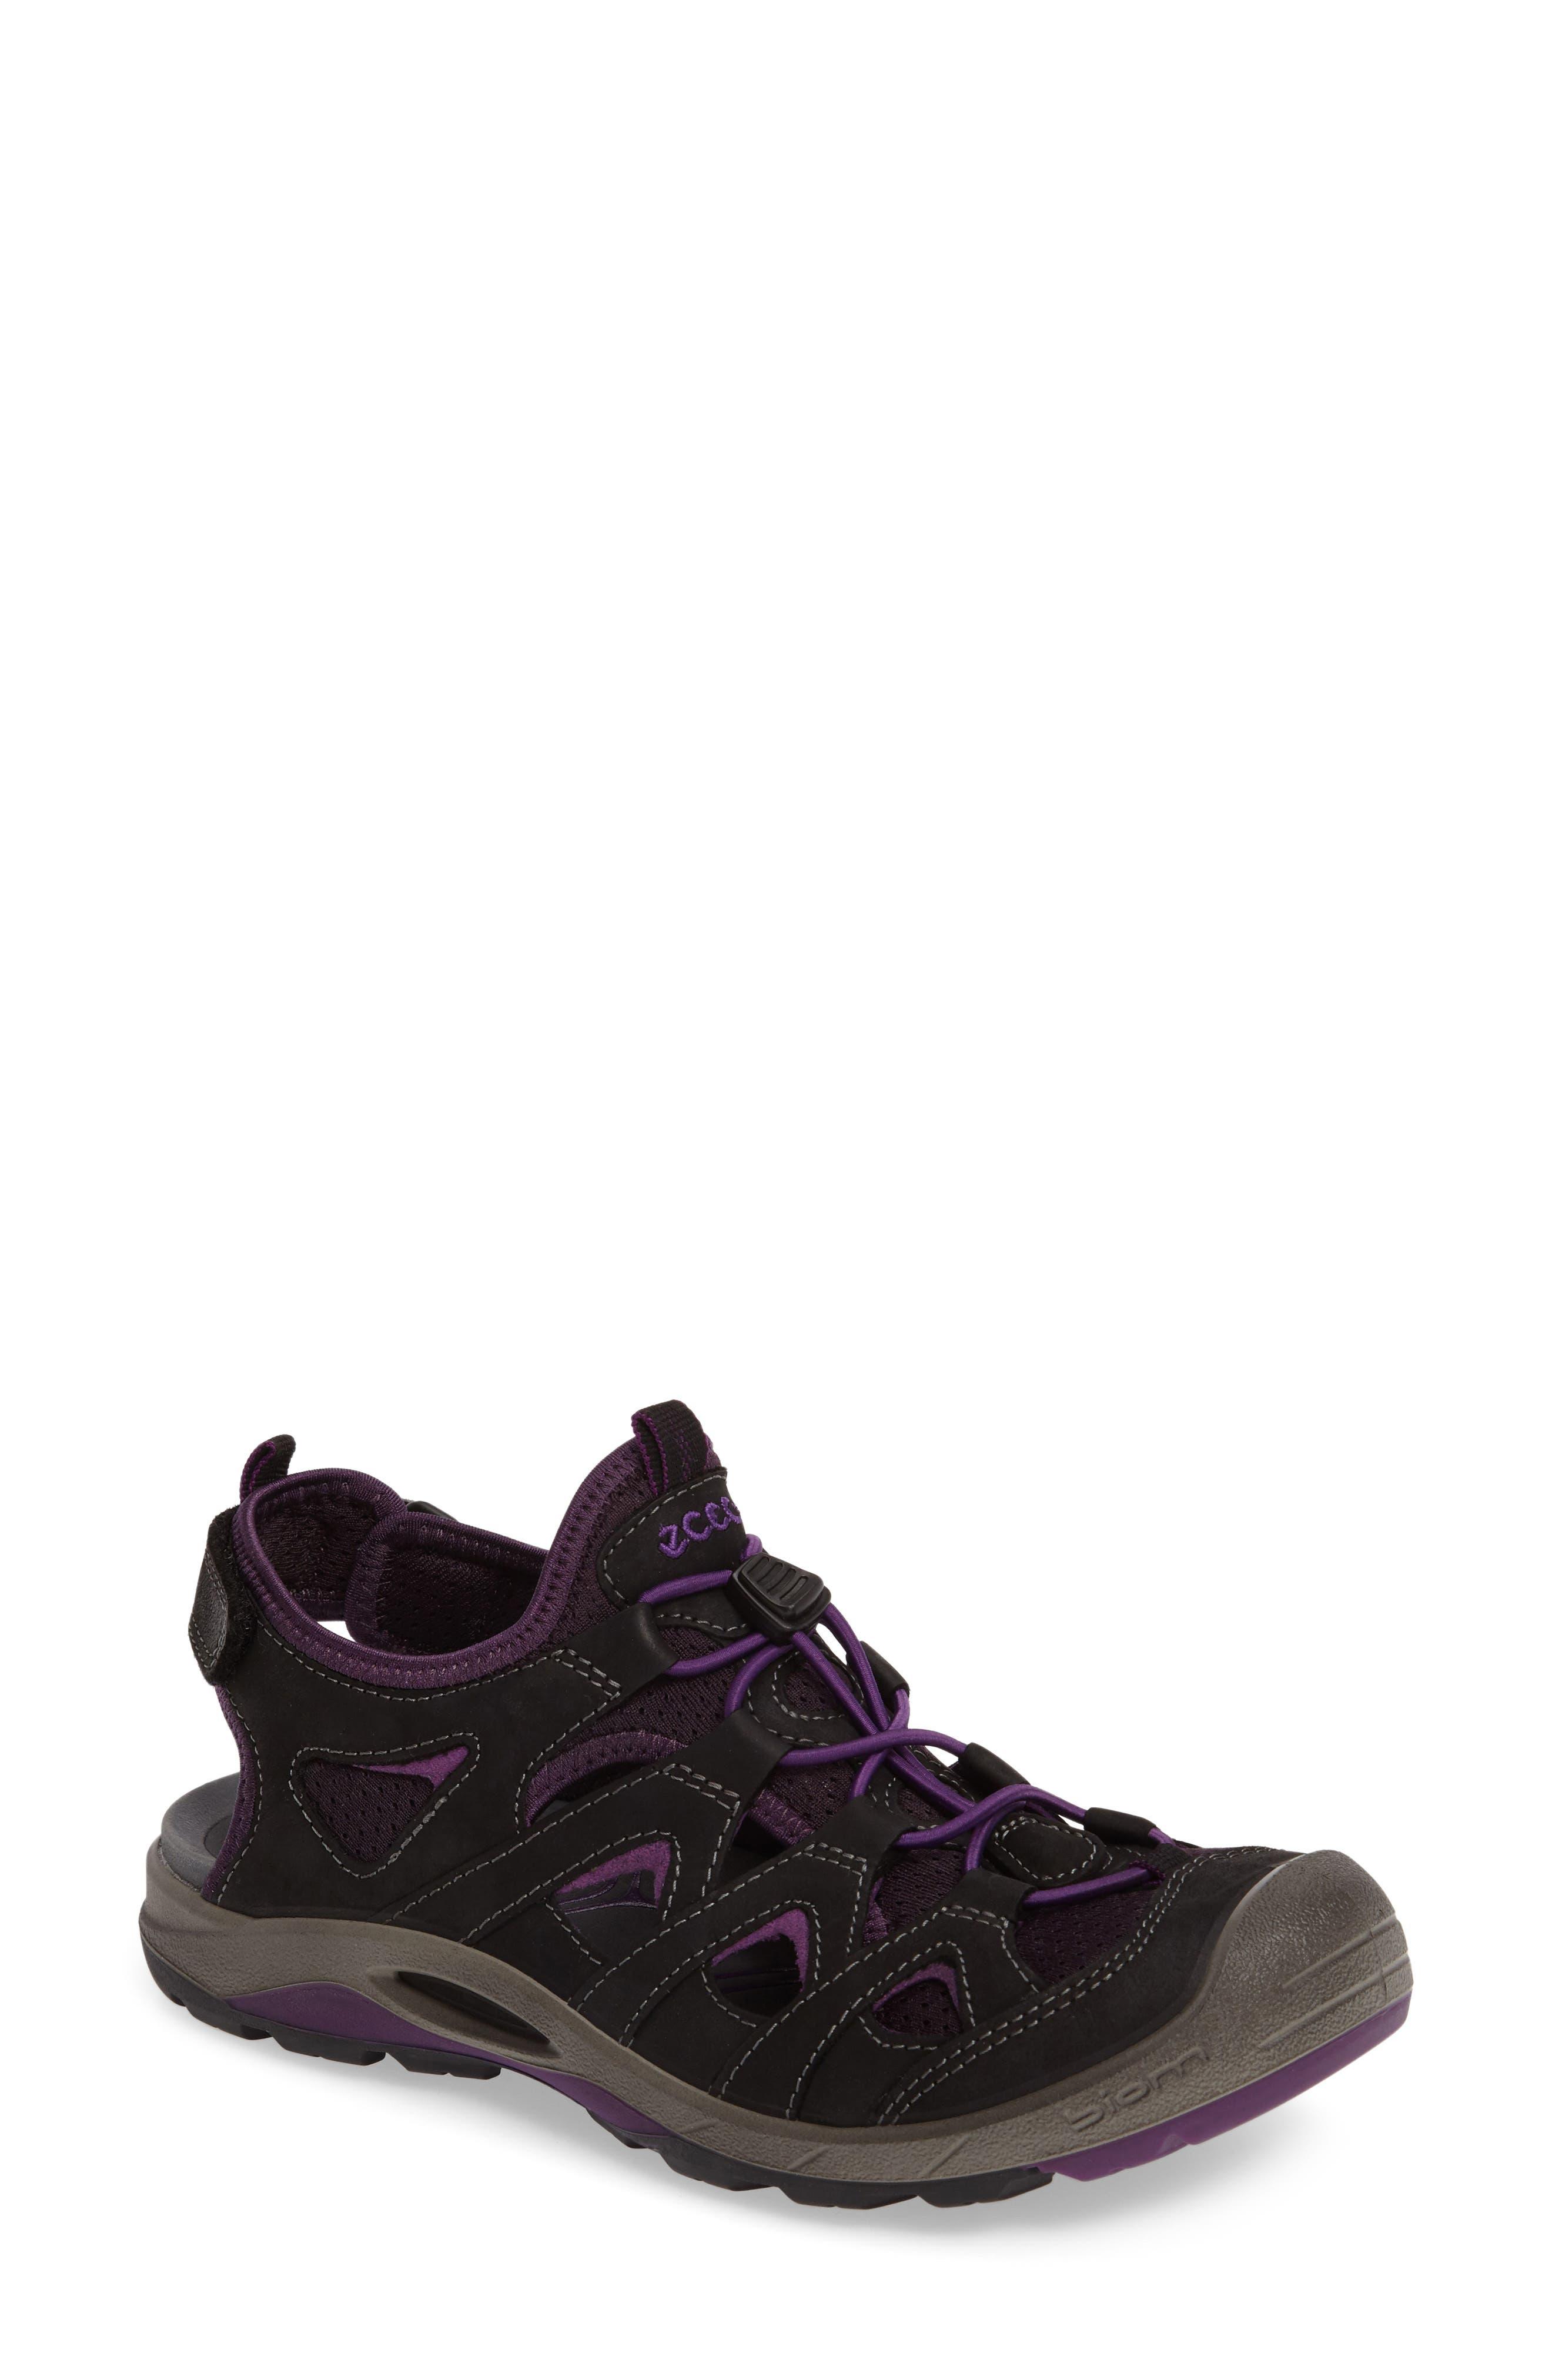 'Biom Delta Offroad' Sneaker,                         Main,                         color, Black/ Imperial Purple Leather